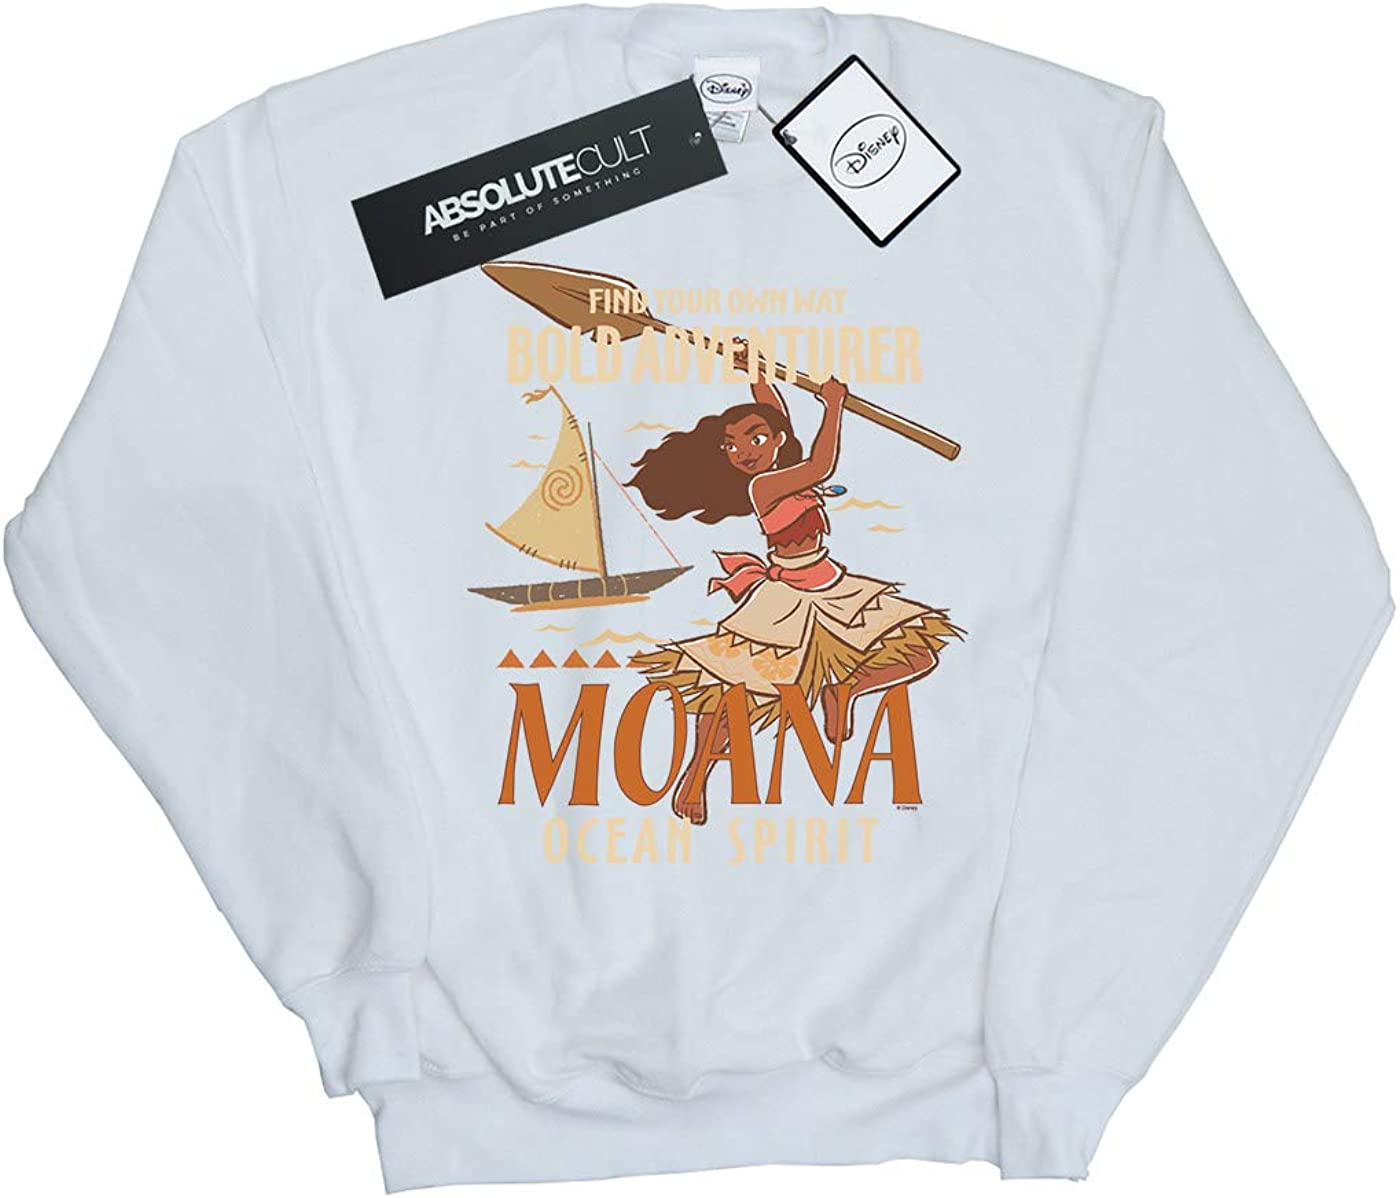 Disney Girls Moana Find Your Own Way Sweatshirt